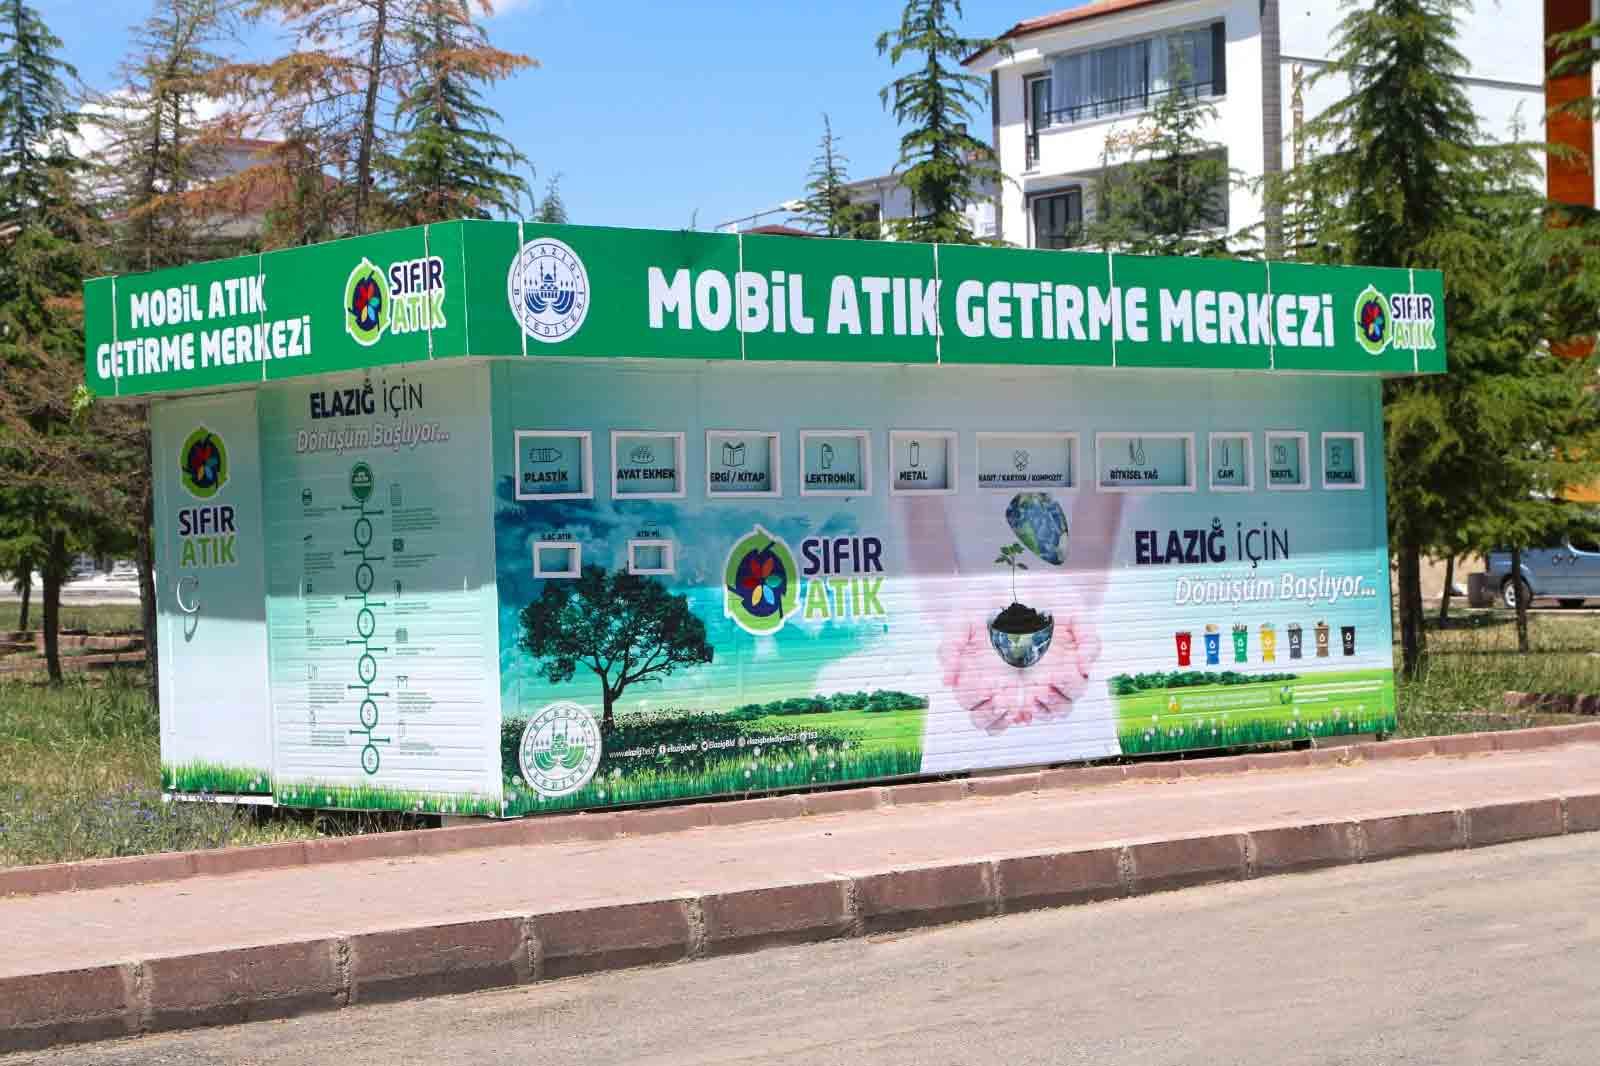 BELEDİYE'DEN MAHALLELERE MOBİL ATIK MERKEZİ